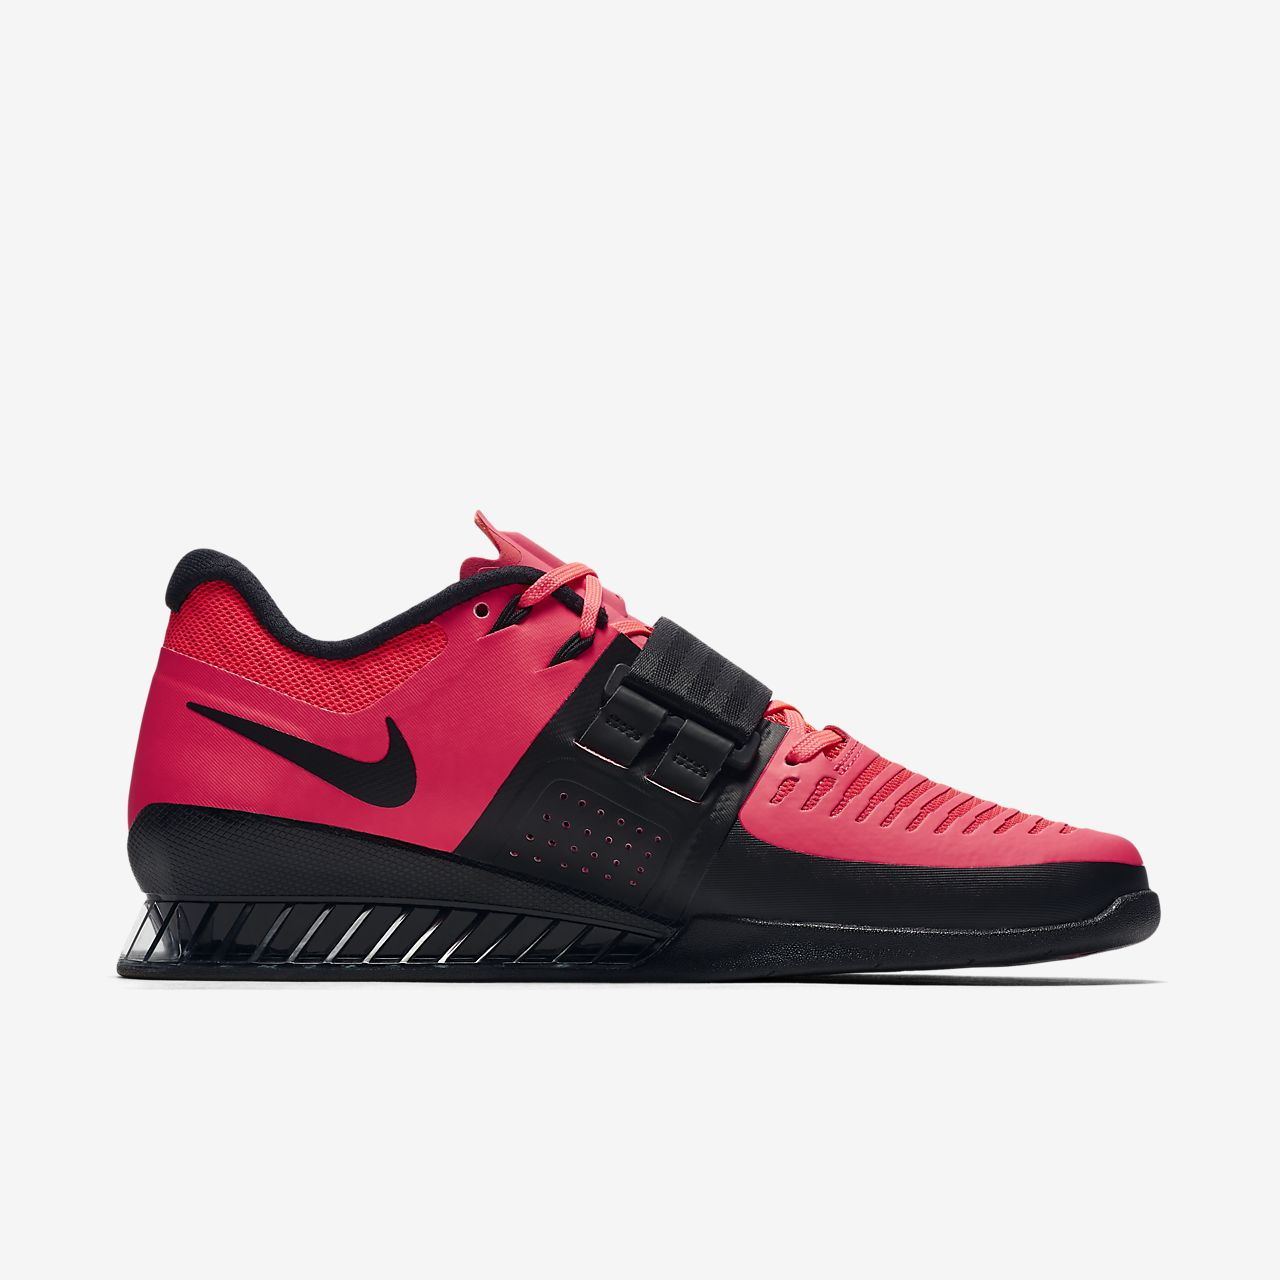 Low Resolution Nike Romaleos 3 Gewichtheberschuh Nike Romaleos 3  Gewichtheberschuh